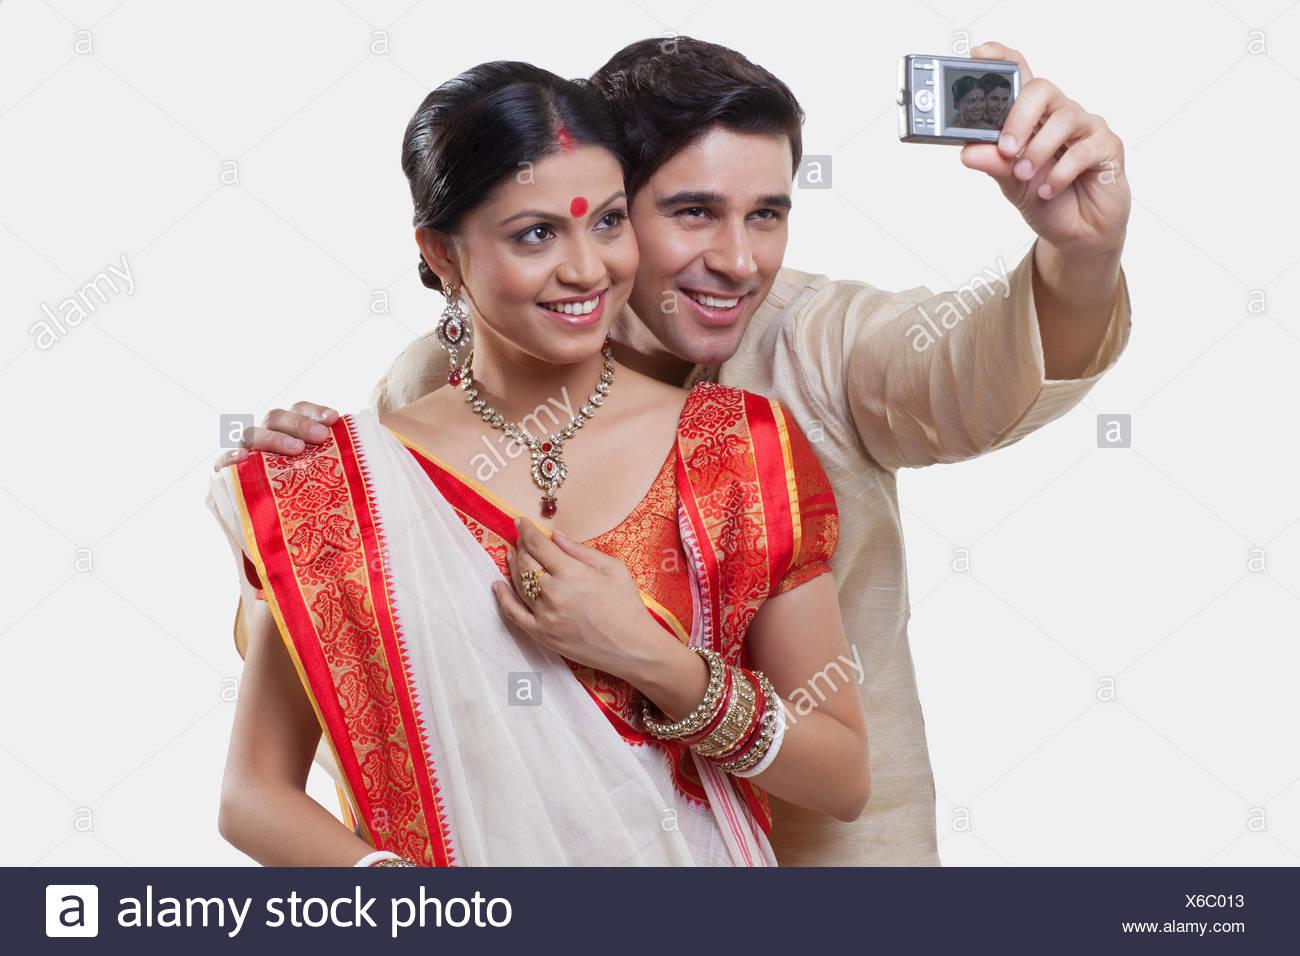 Bengali couple taking a self portrait stock image